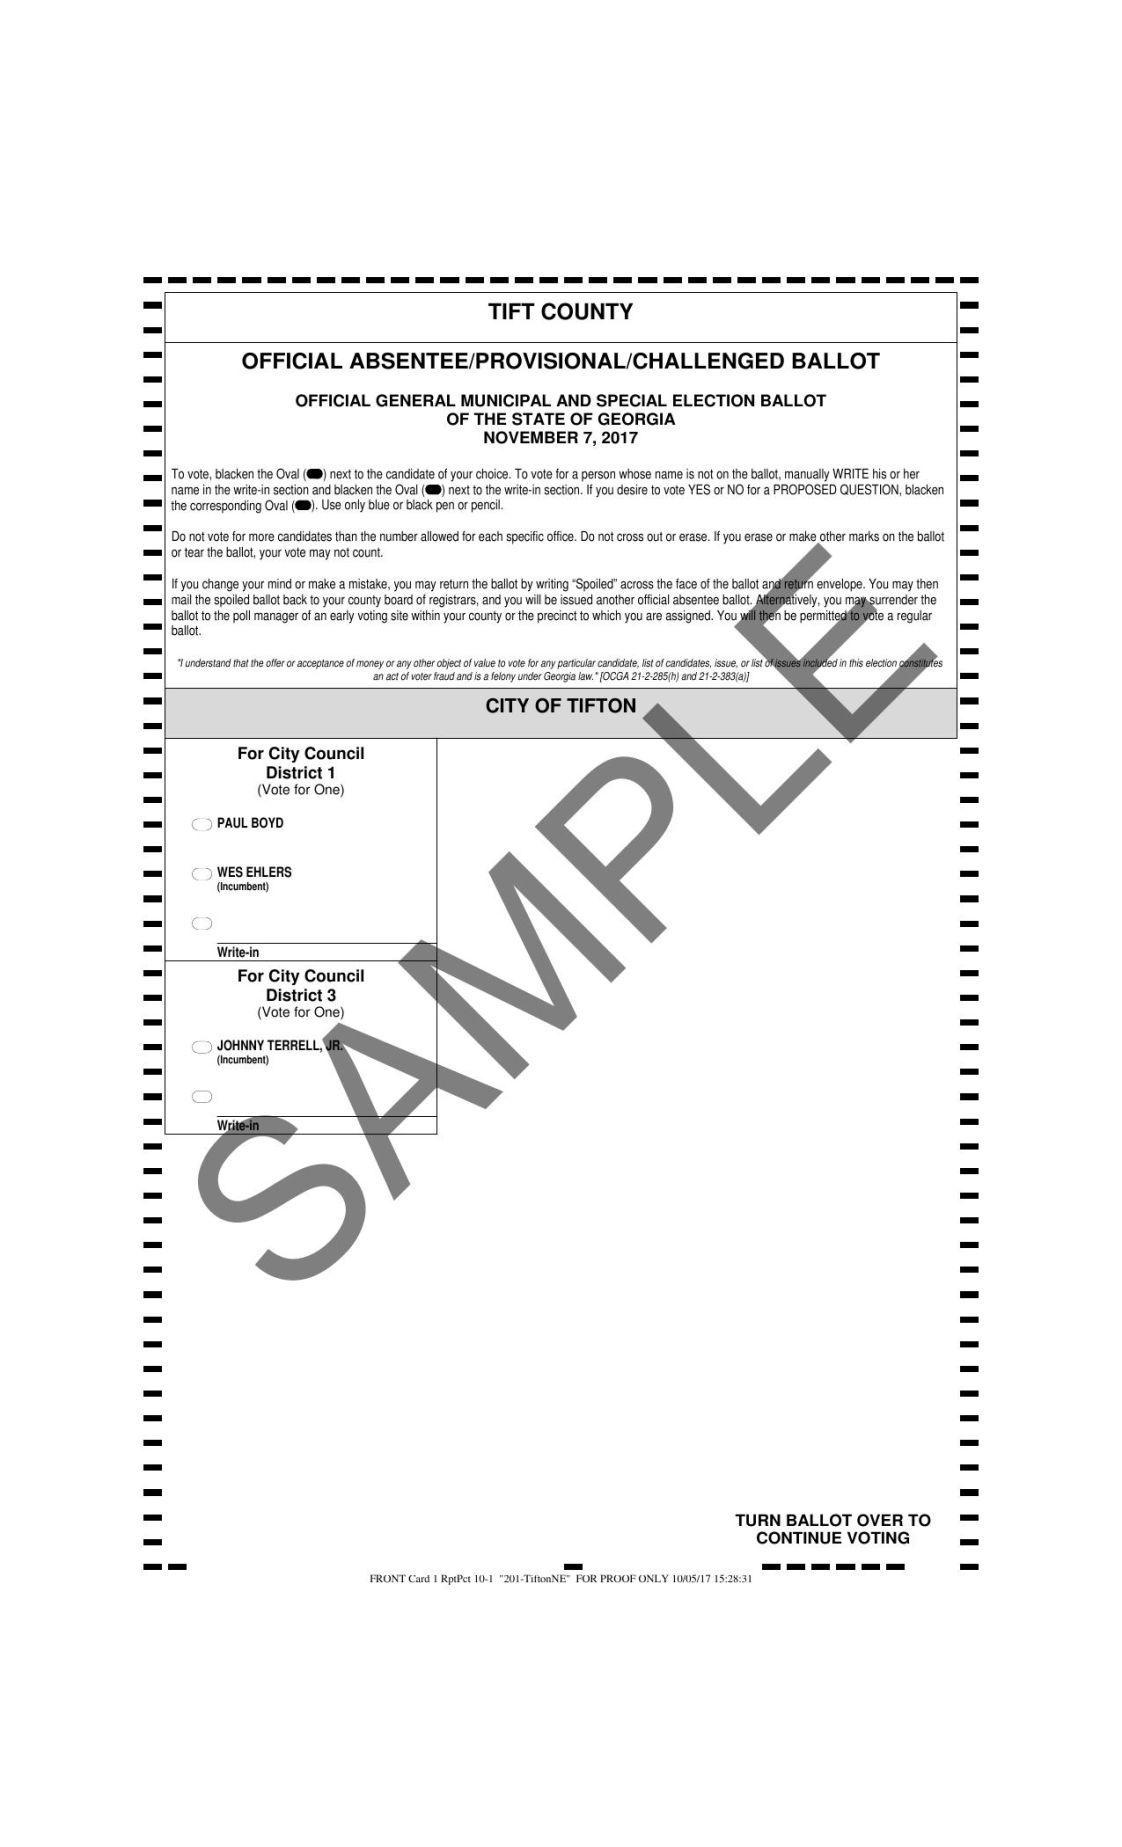 first image of 6 Printable Voting Ballot Template Yyatt with Sample Tift County ballots | | tiftongazette.com